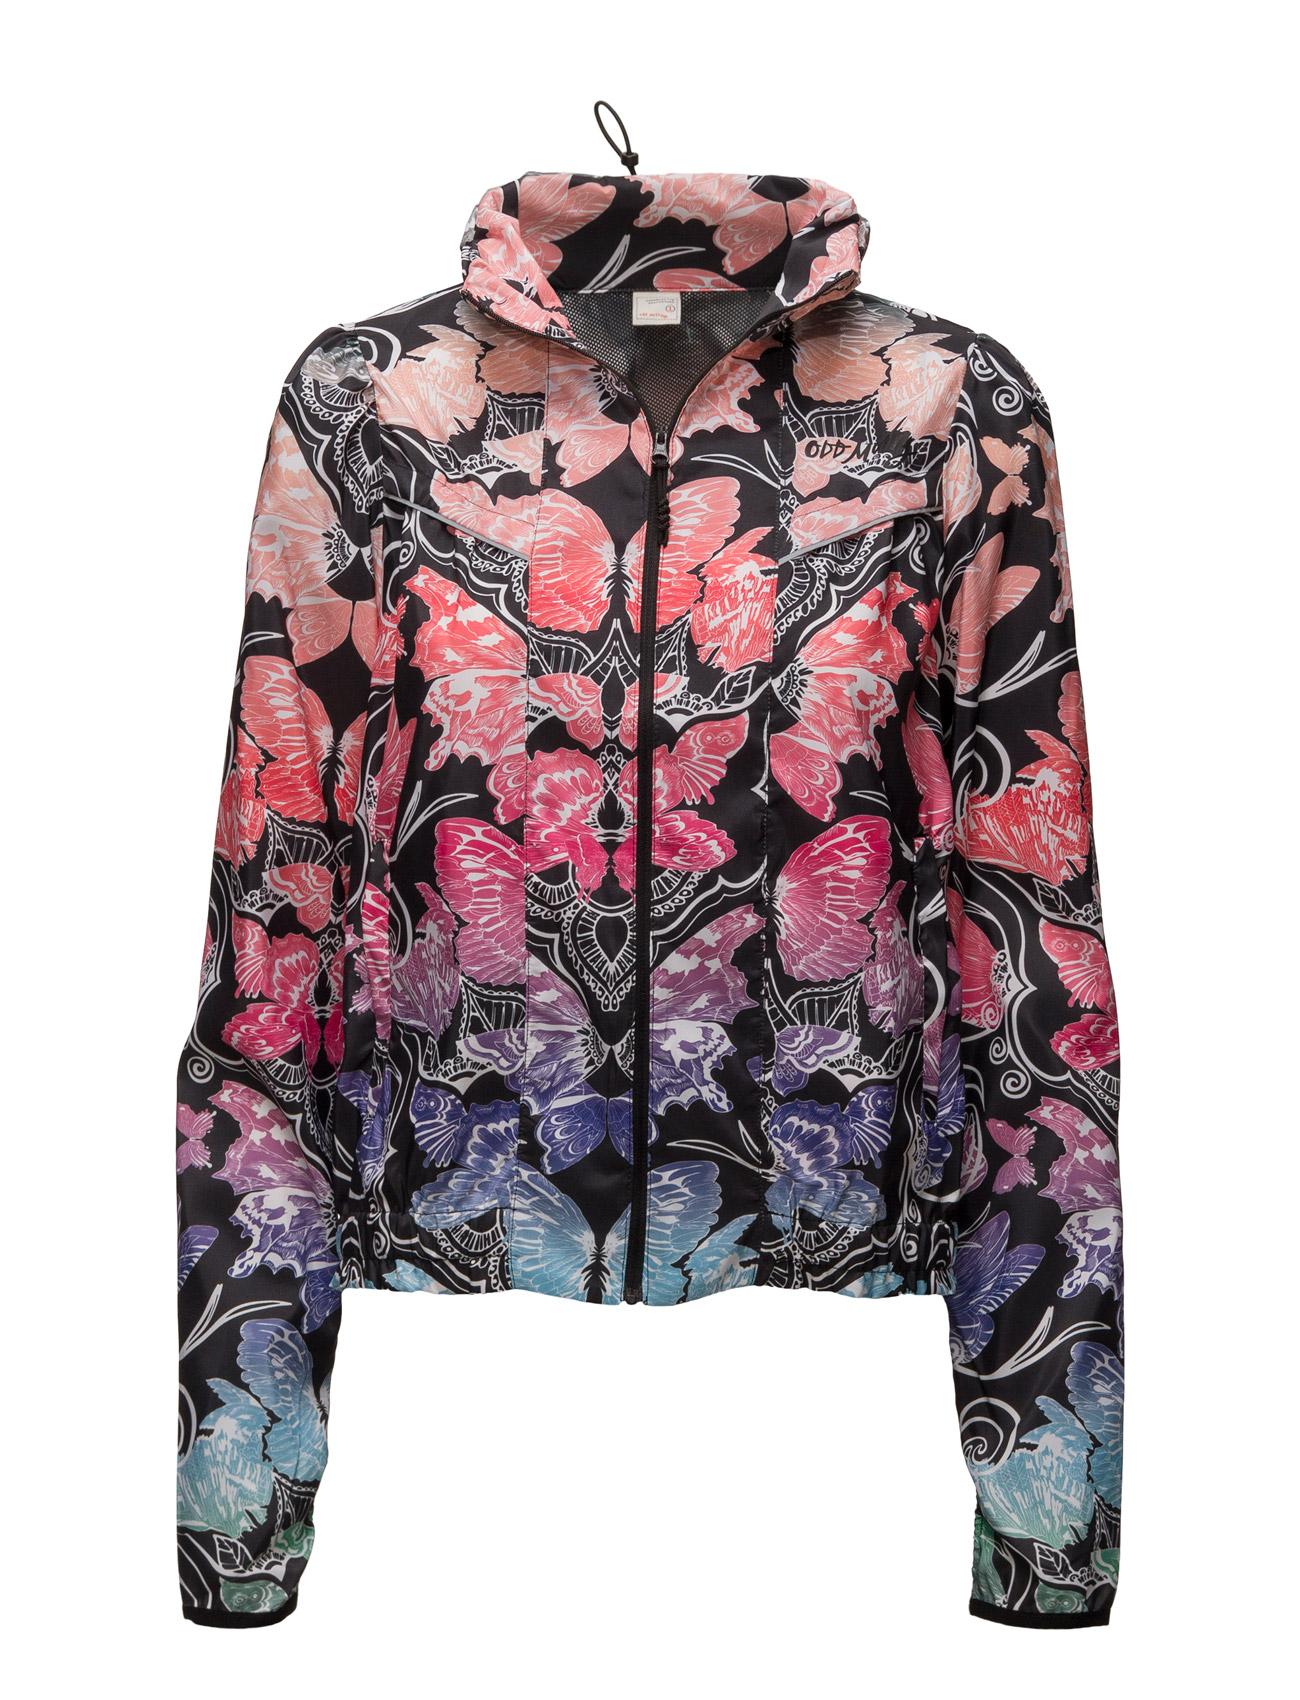 ODD MOLLY ACTIVE WEAR upbeat jacket